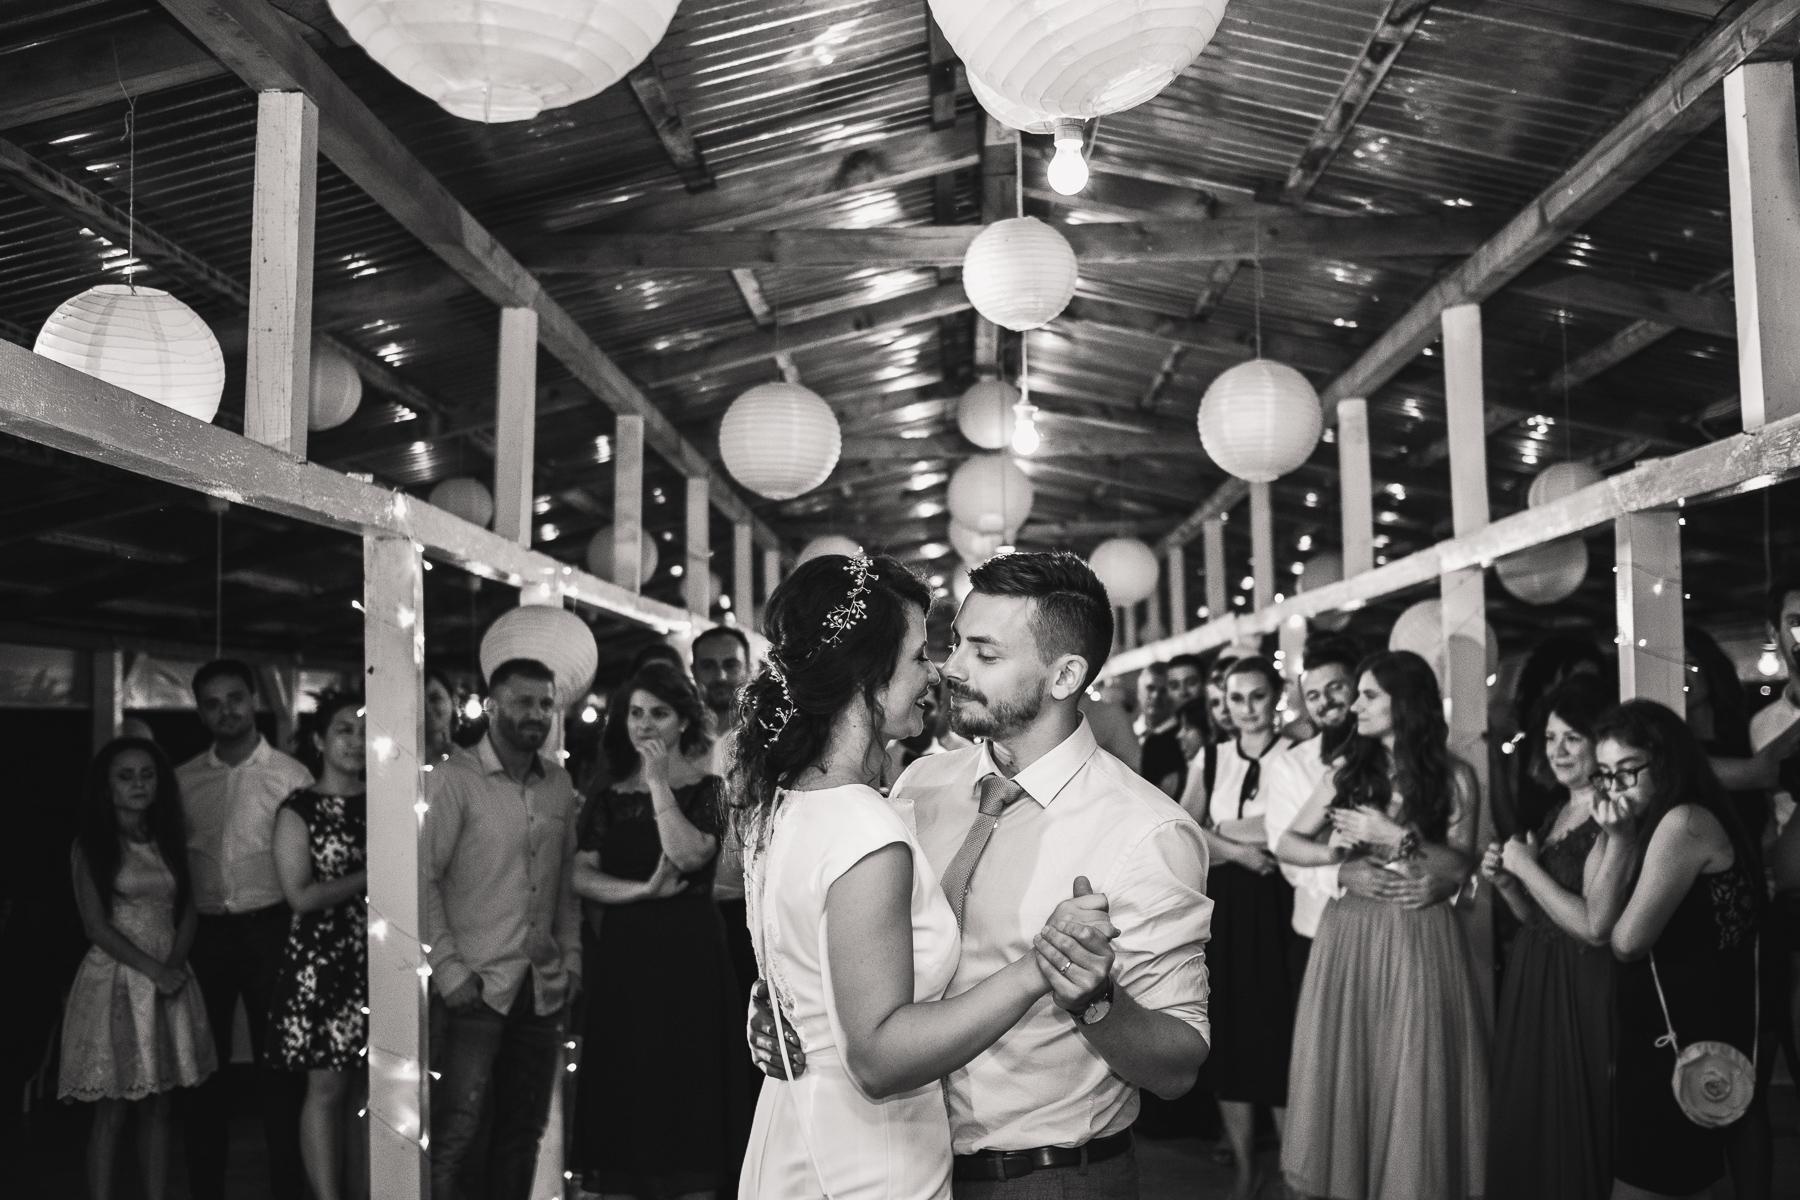 wedding deersphotography0077